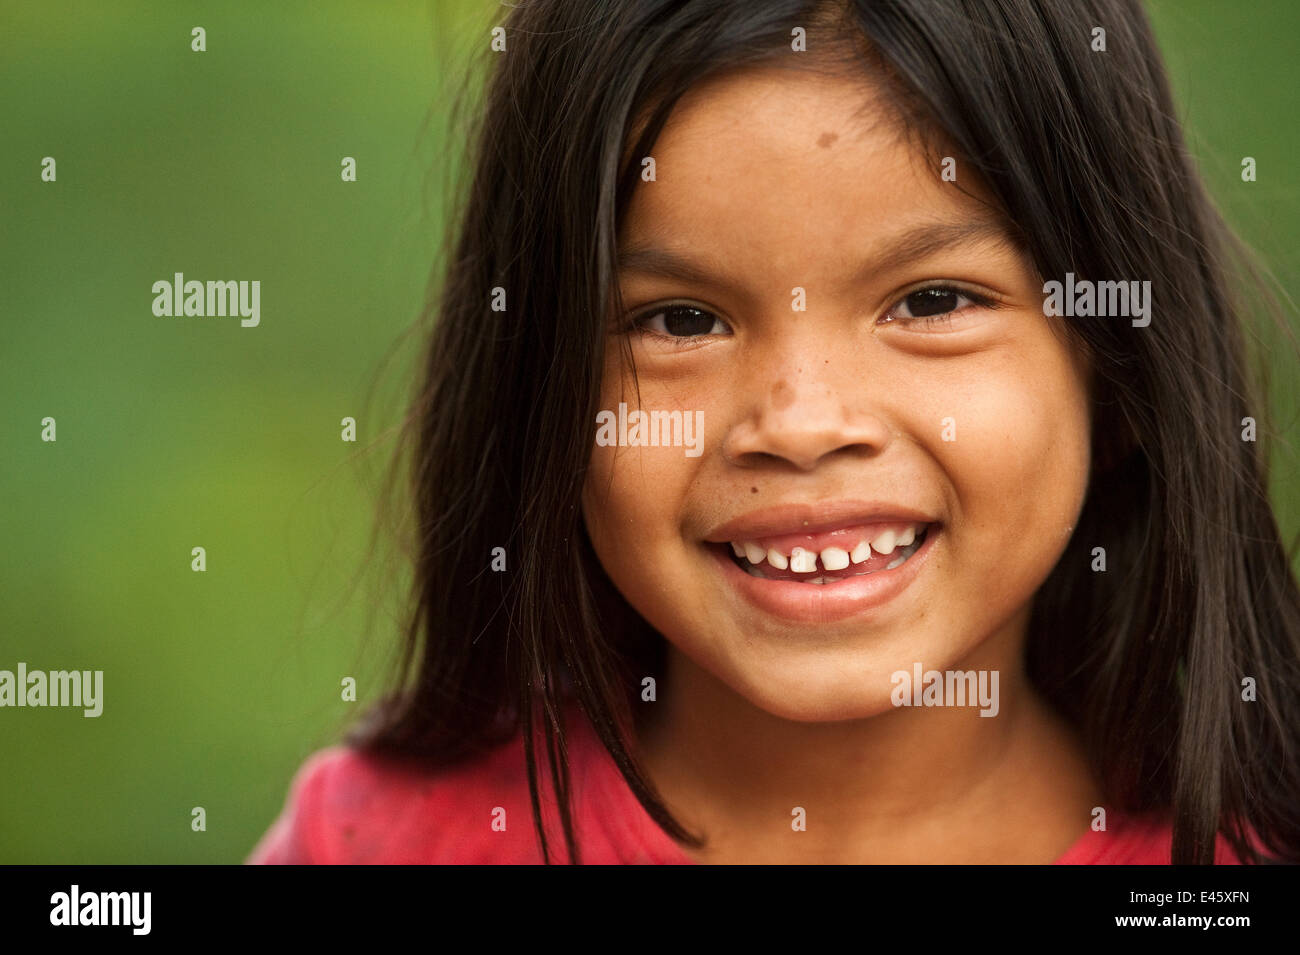 Macushi girl from Fairview Amerindian village, Iwokrama Reserve, Guyana, July 2009 - Stock Image